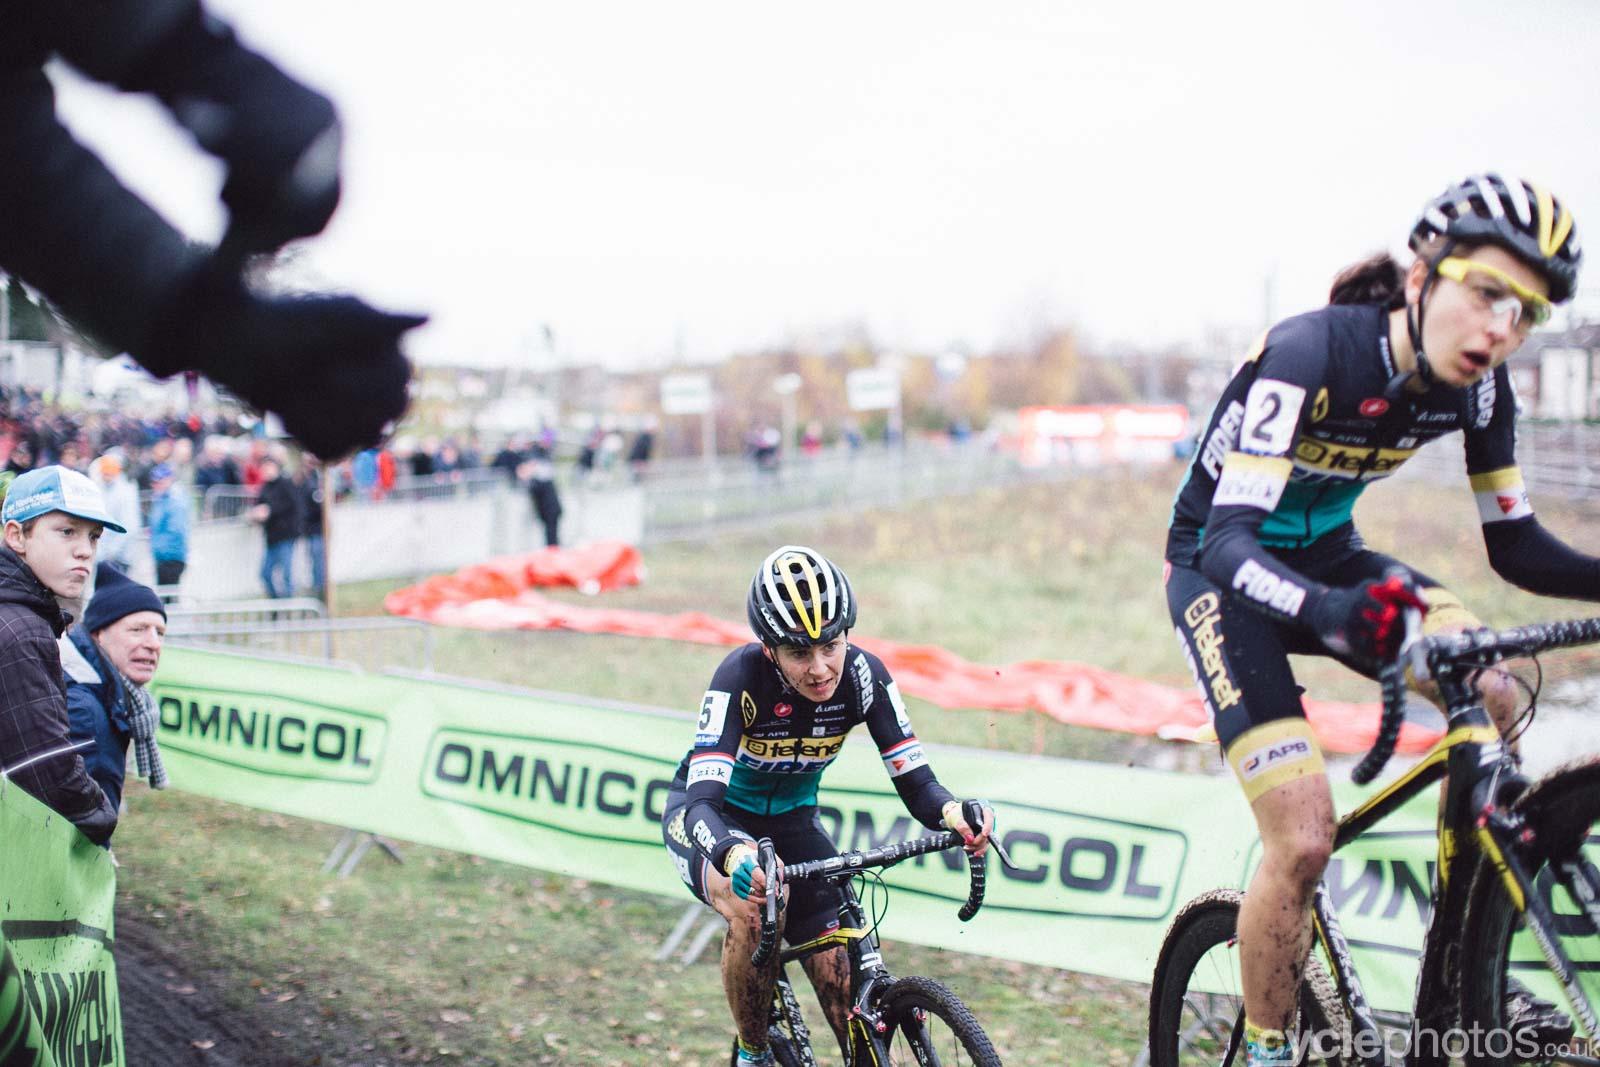 2015-cyclephotos-cyclocross-essen-135518-nikki-harris